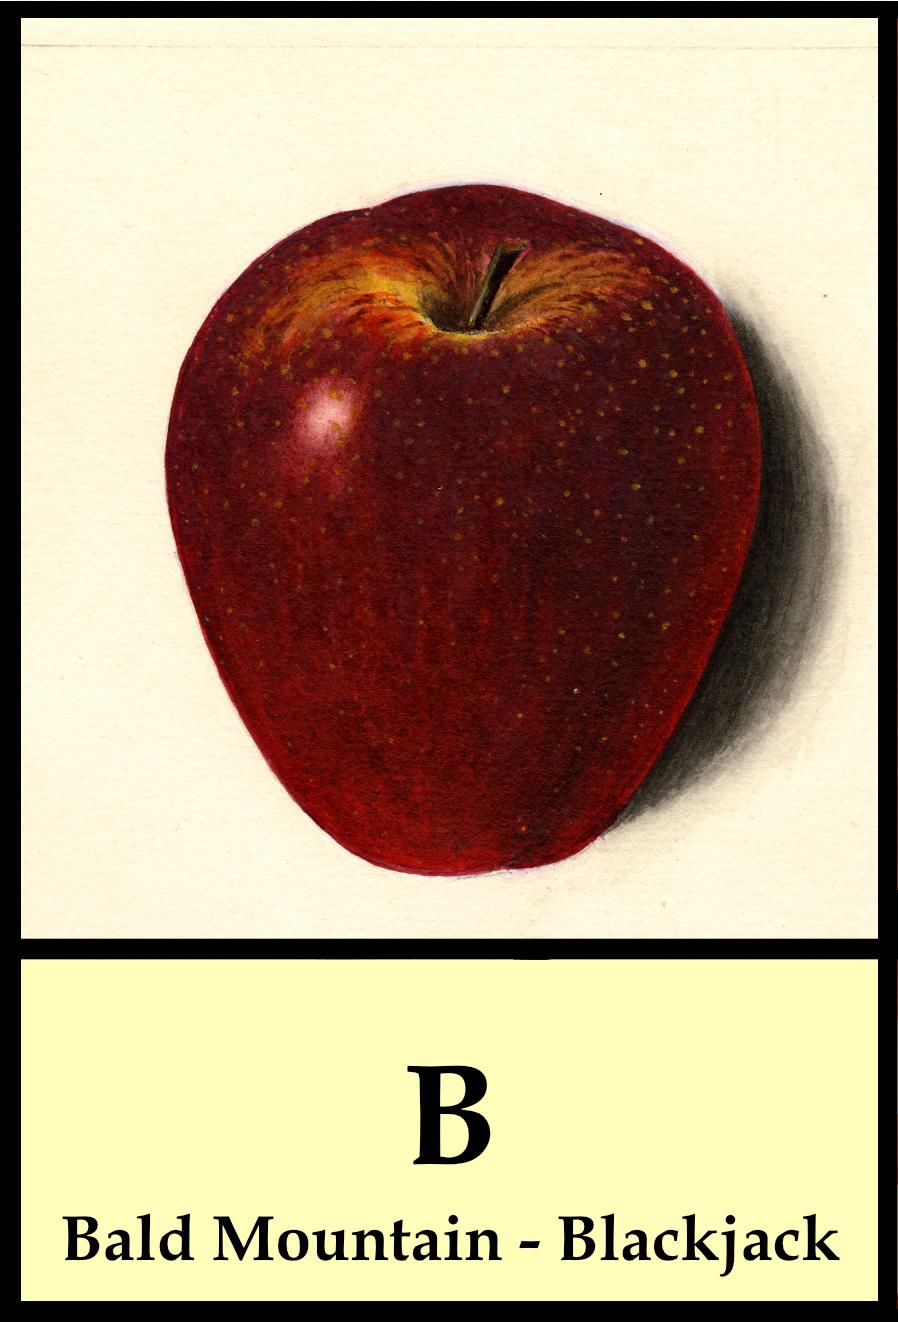 B apple - Bald Mountain to Blackjack